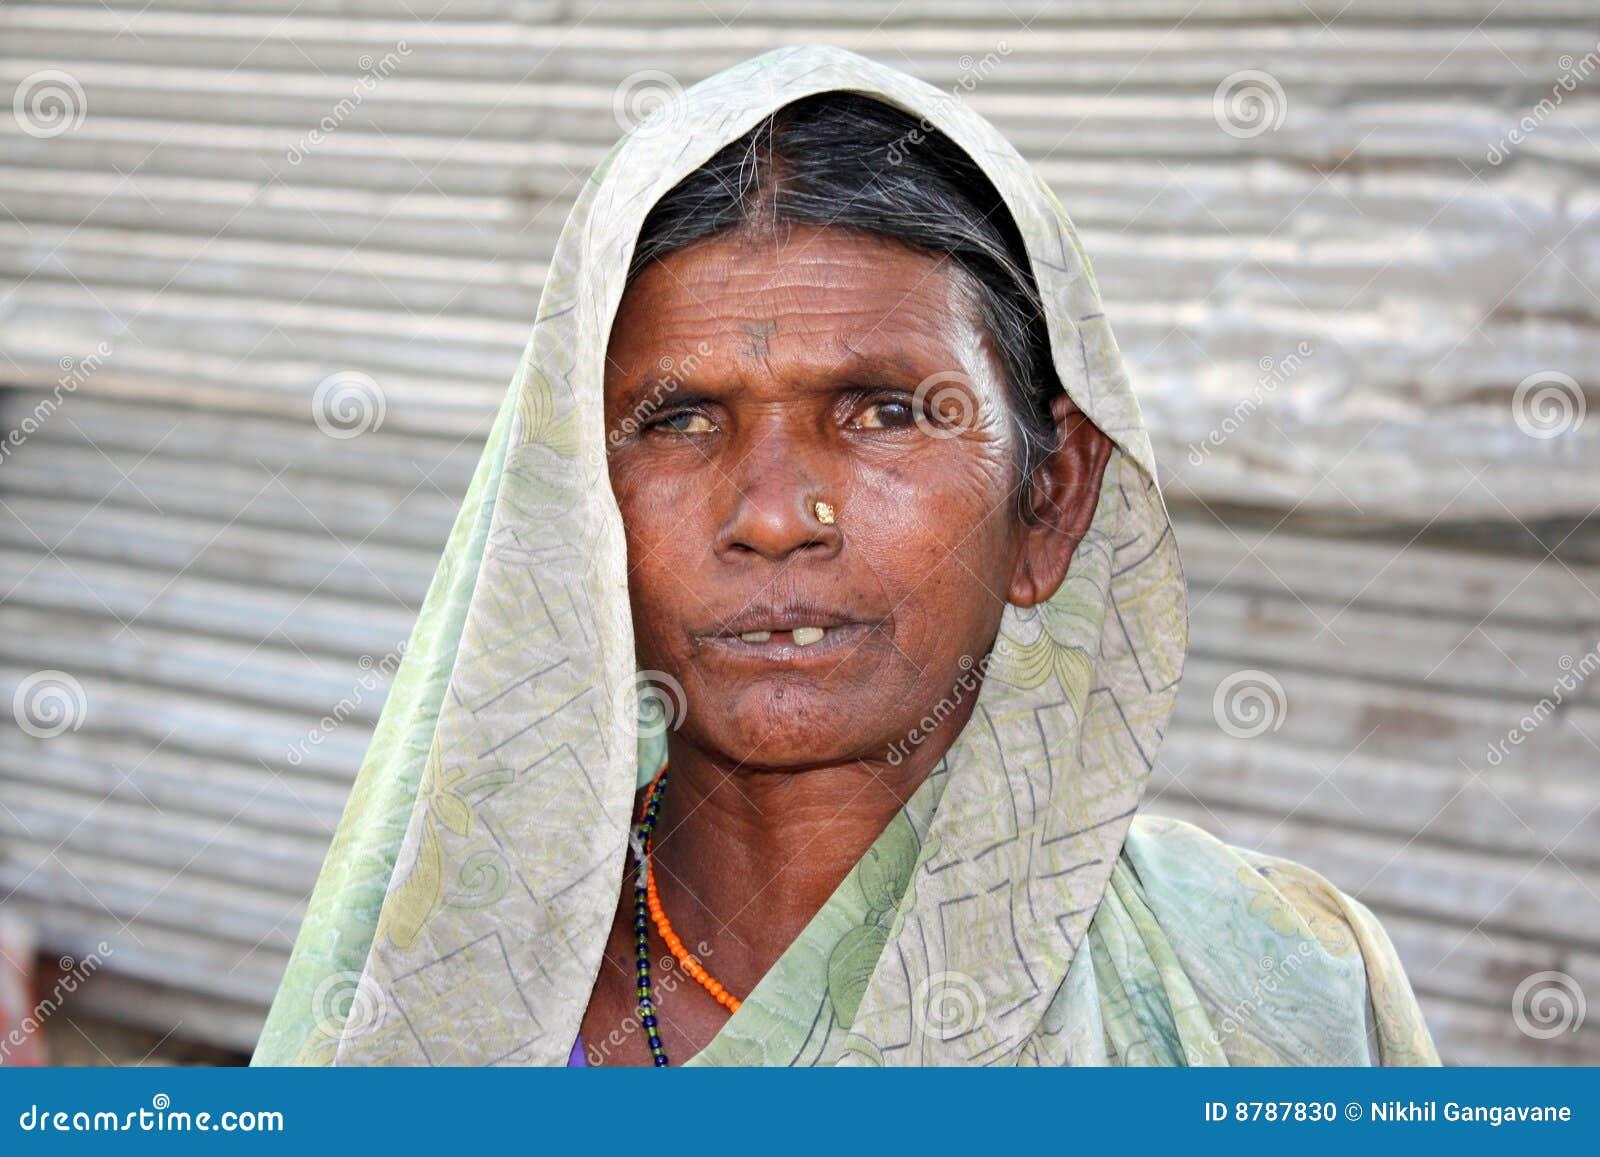 Poor Indian Woman